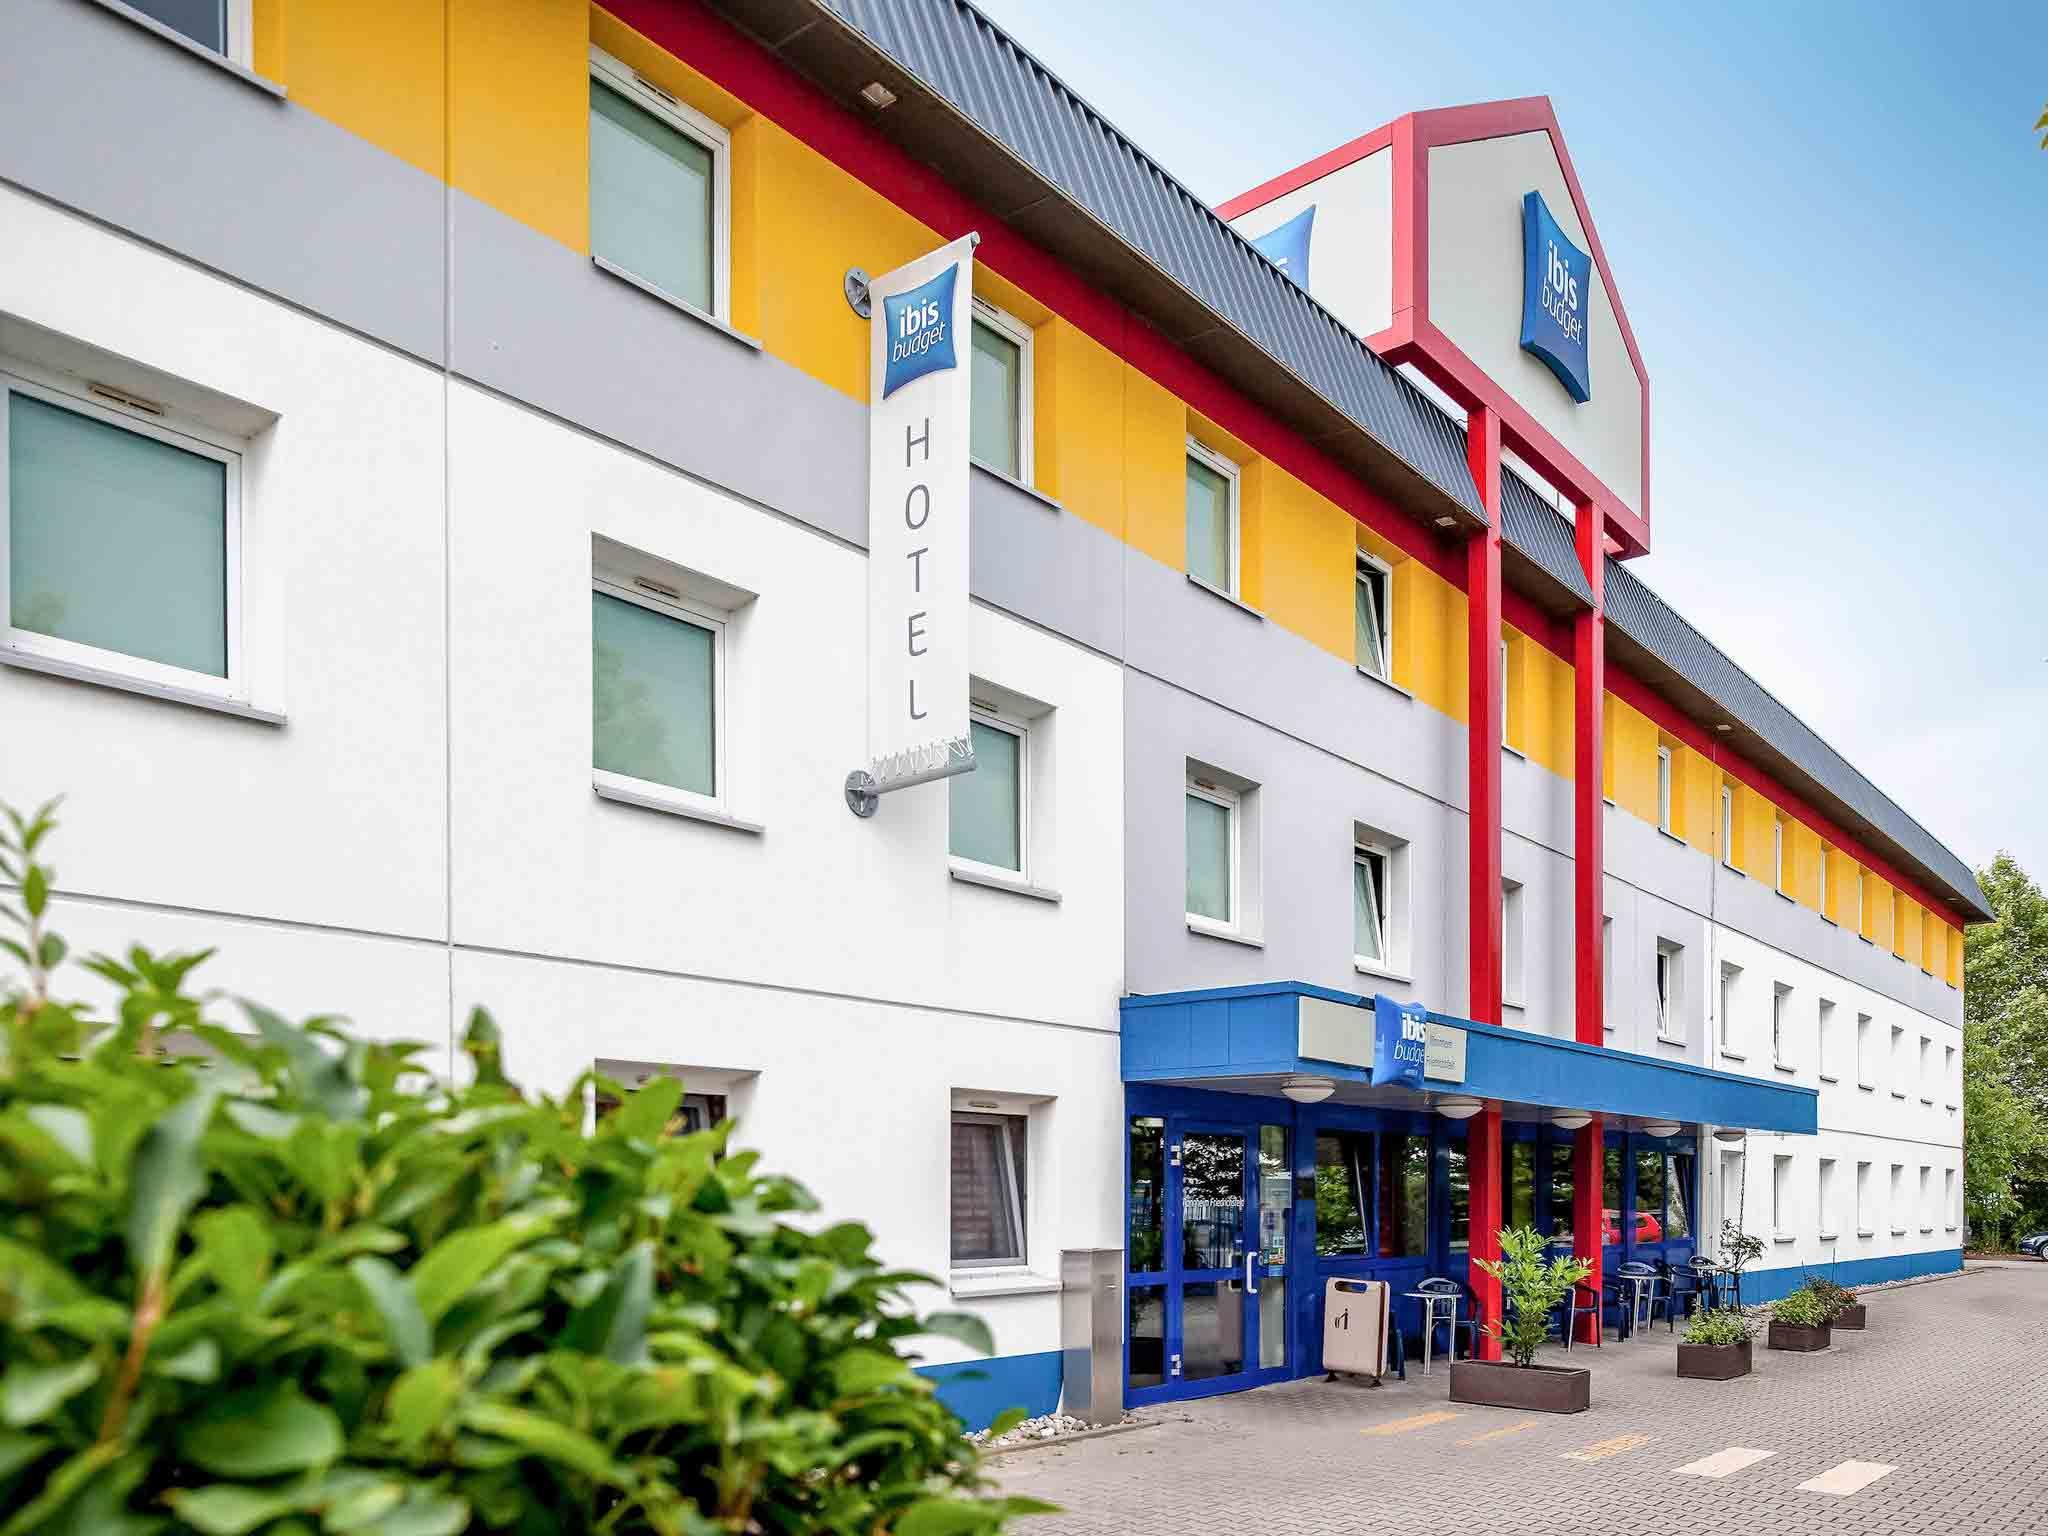 Outdoorküche Buch Butchy : Das zimmer mannheim mannheim maimarkt mannheim home facebook